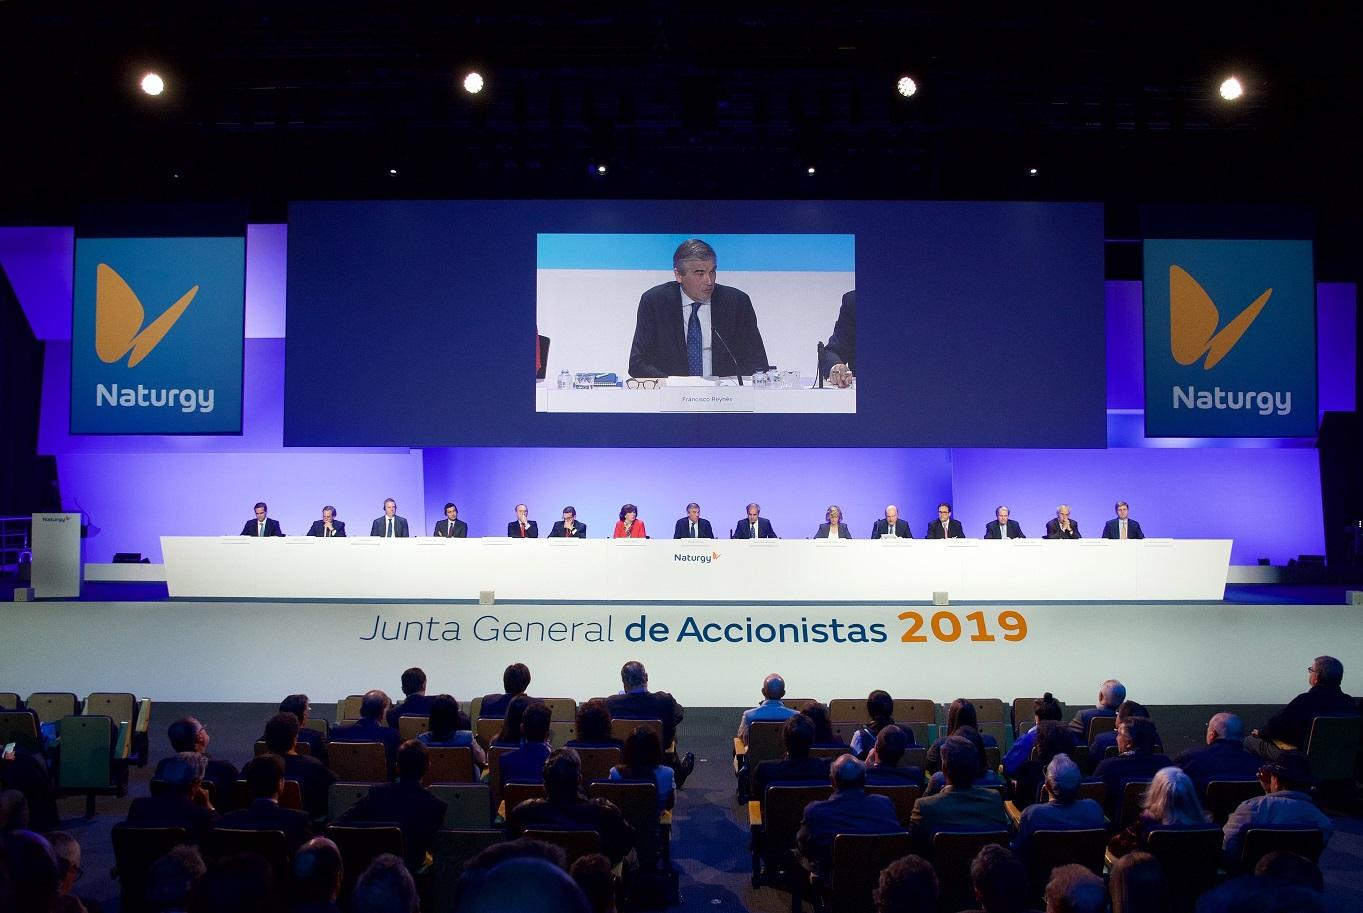 Naturgy aprueba dividendo en junta 2019